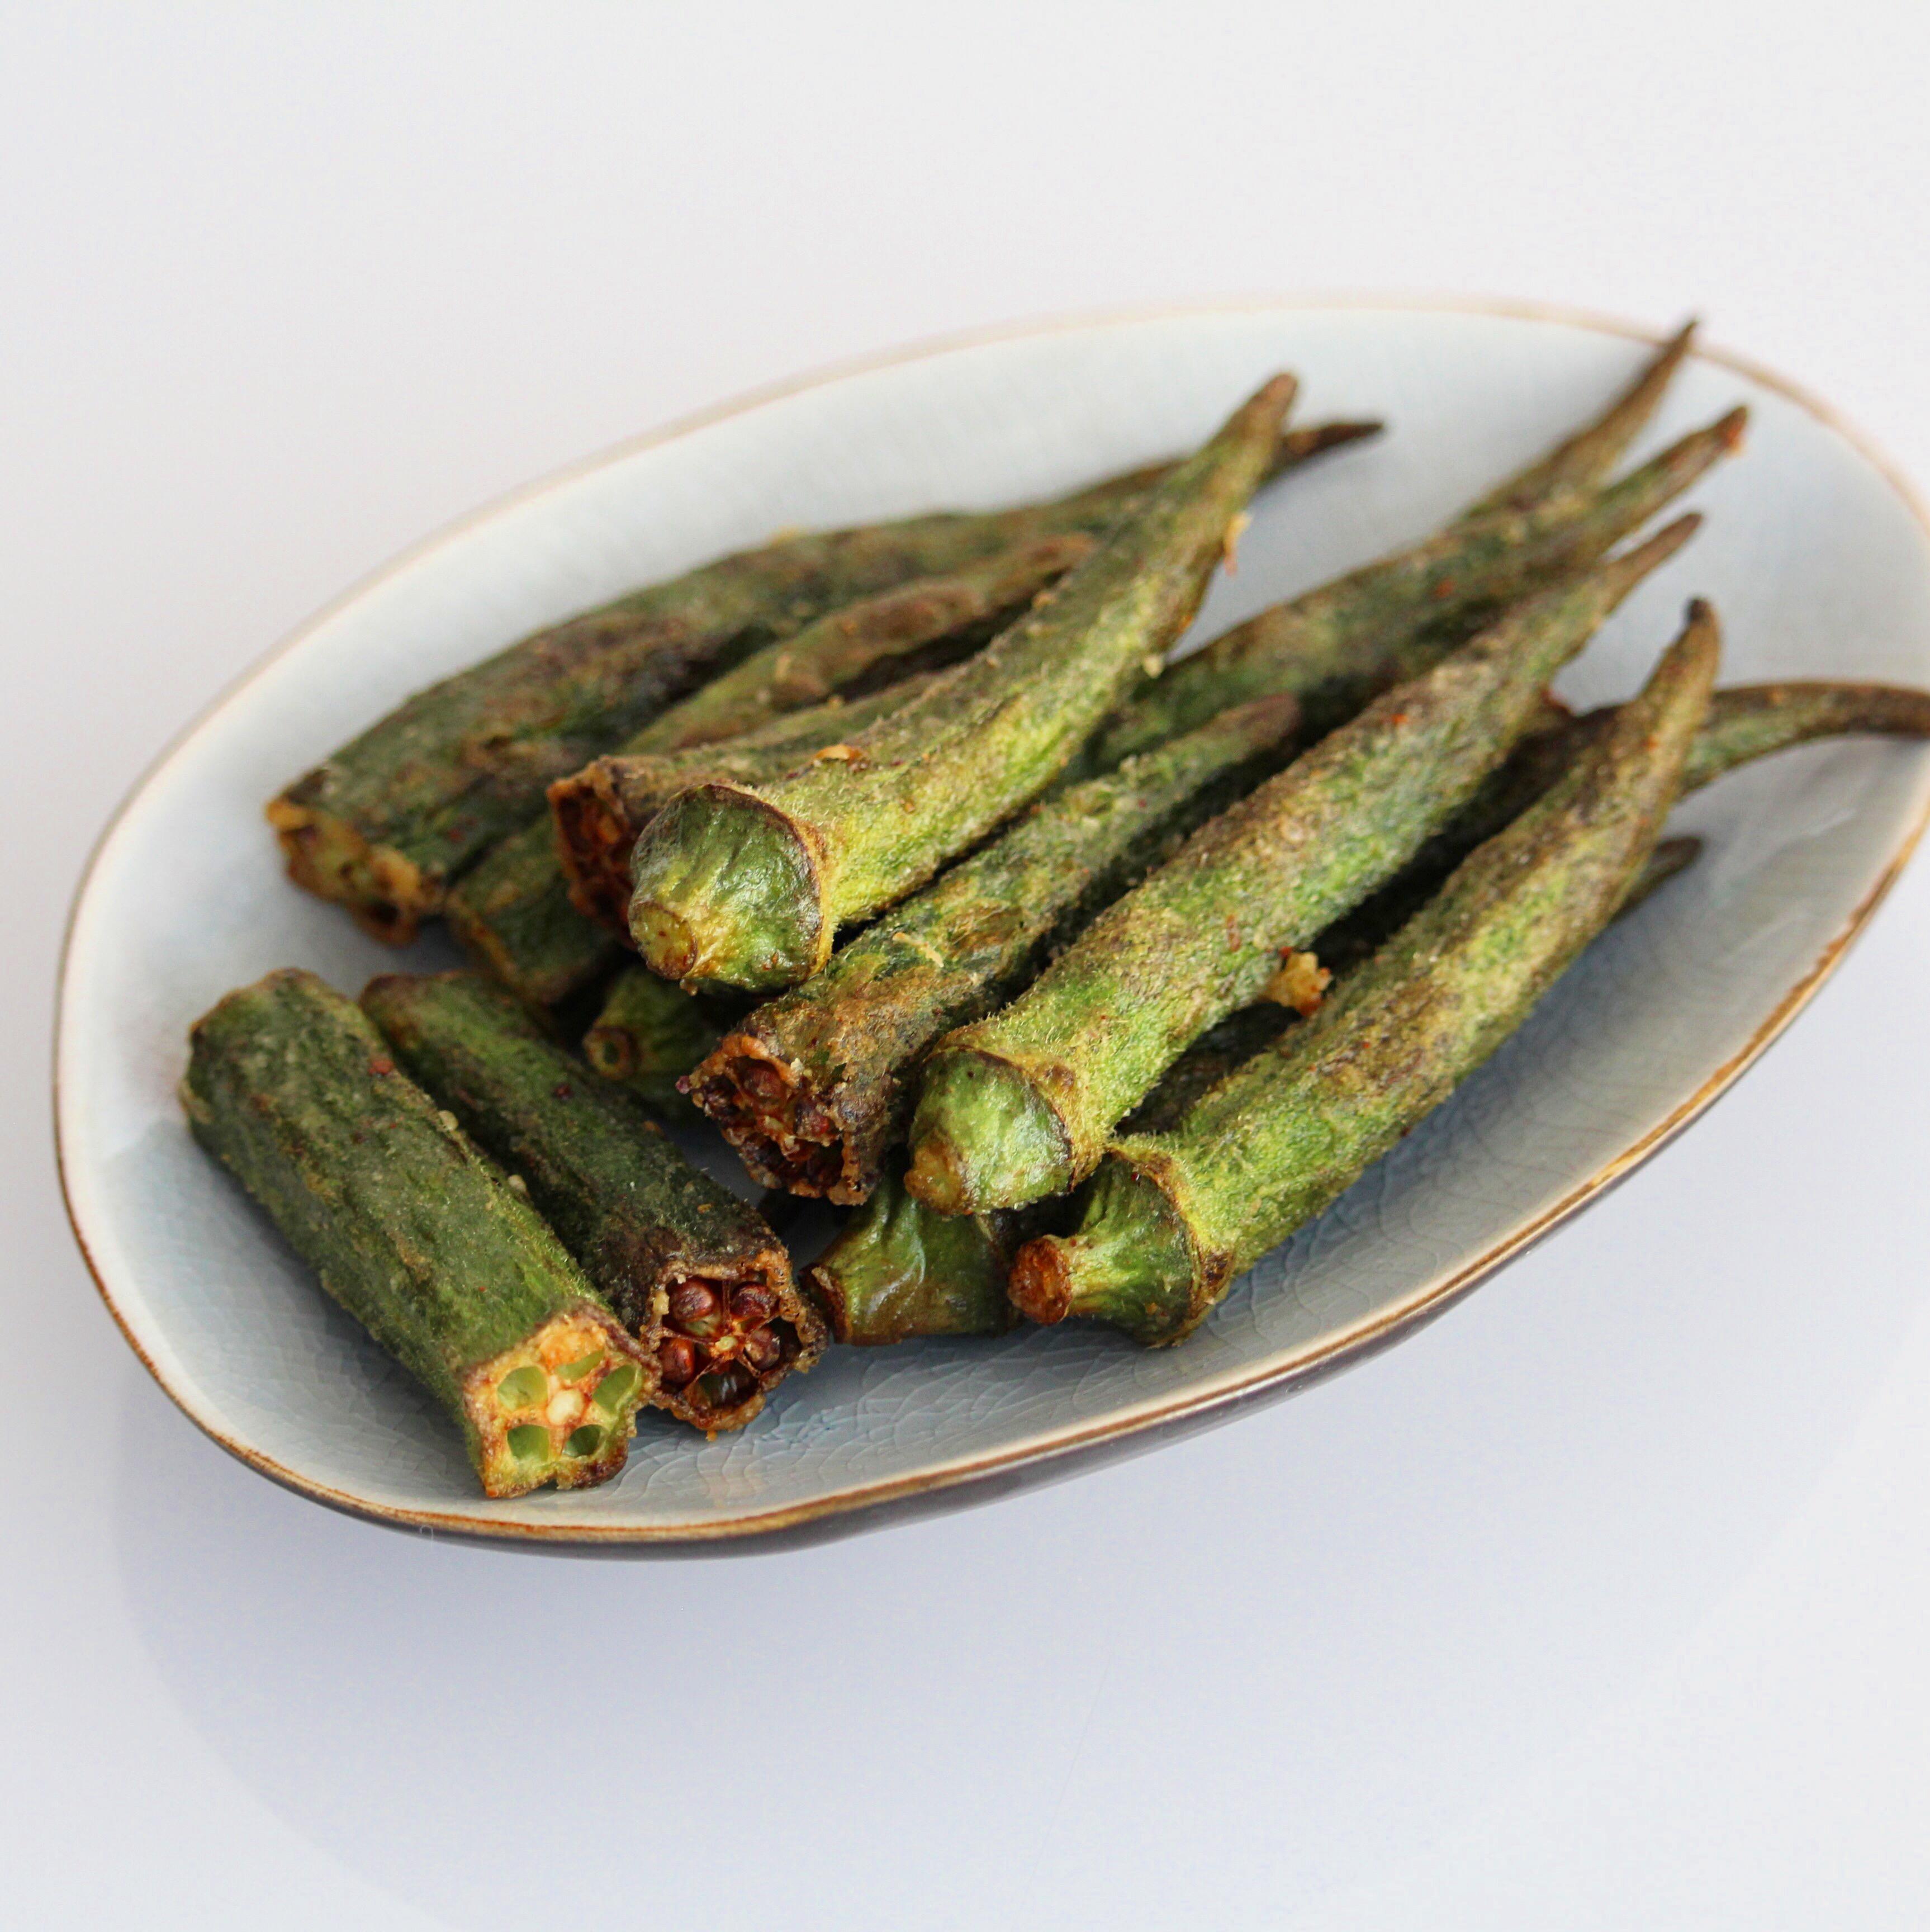 Spicy Air-Fried Okra